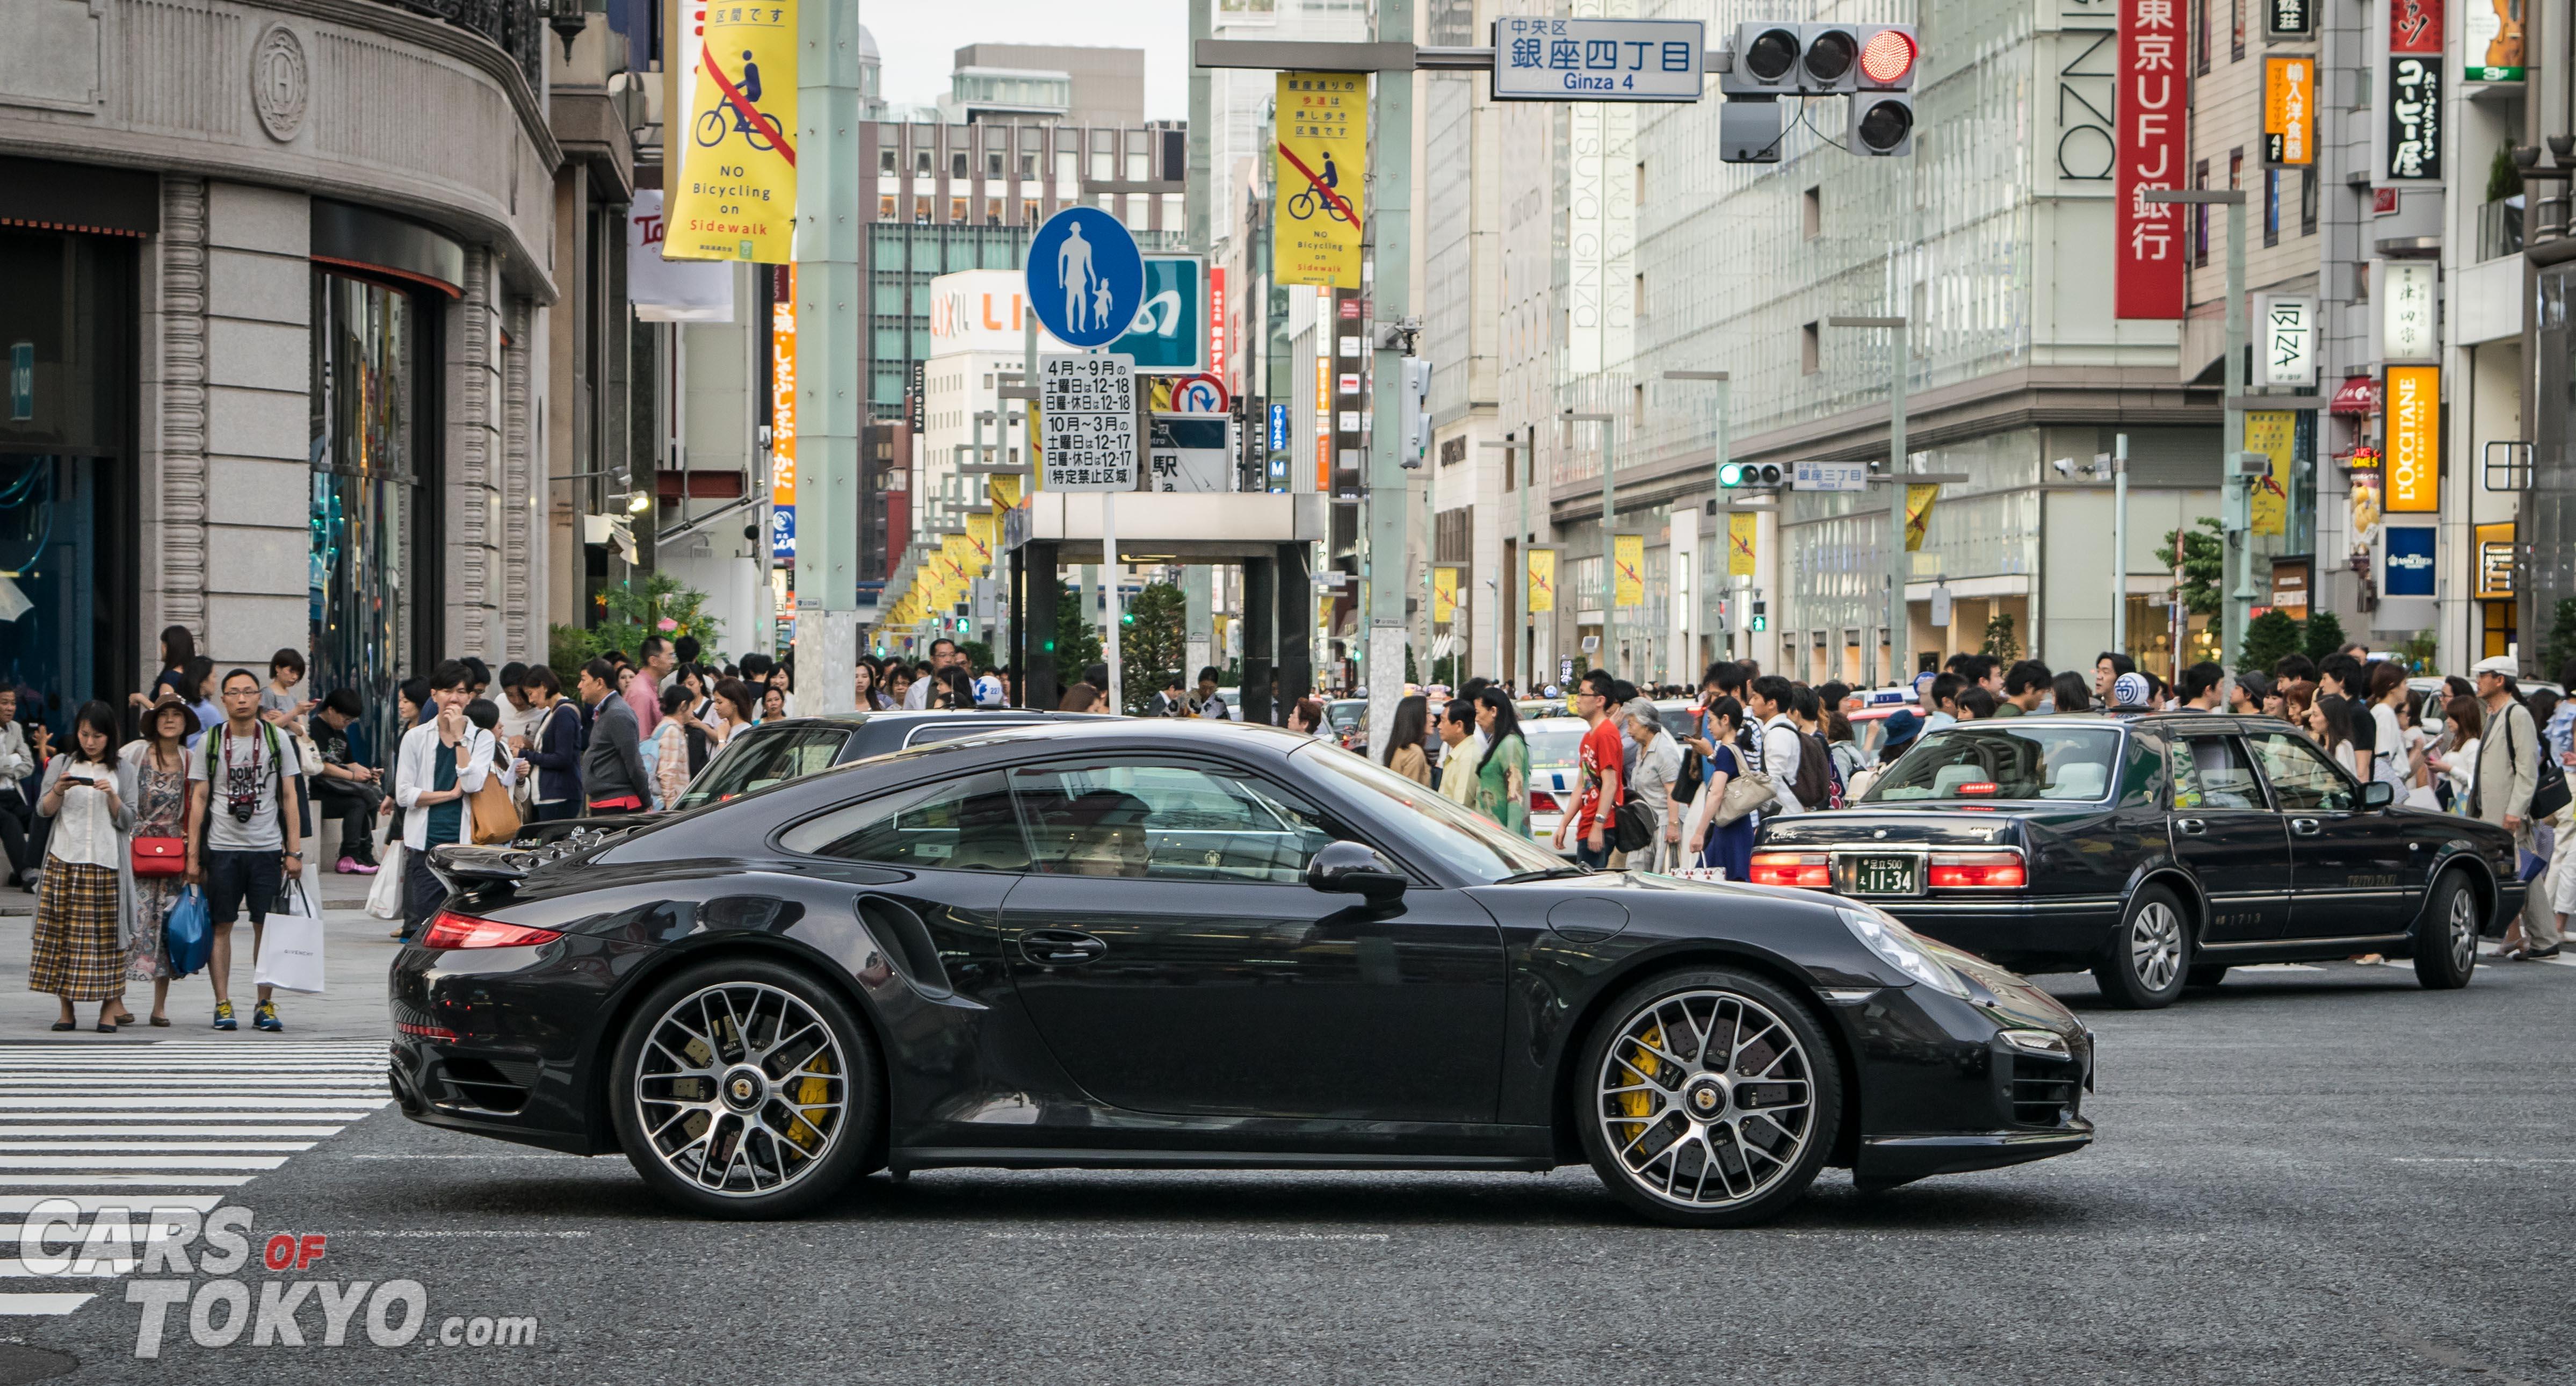 Cars of Tokyo Ginza Porsche 911 Turbo S